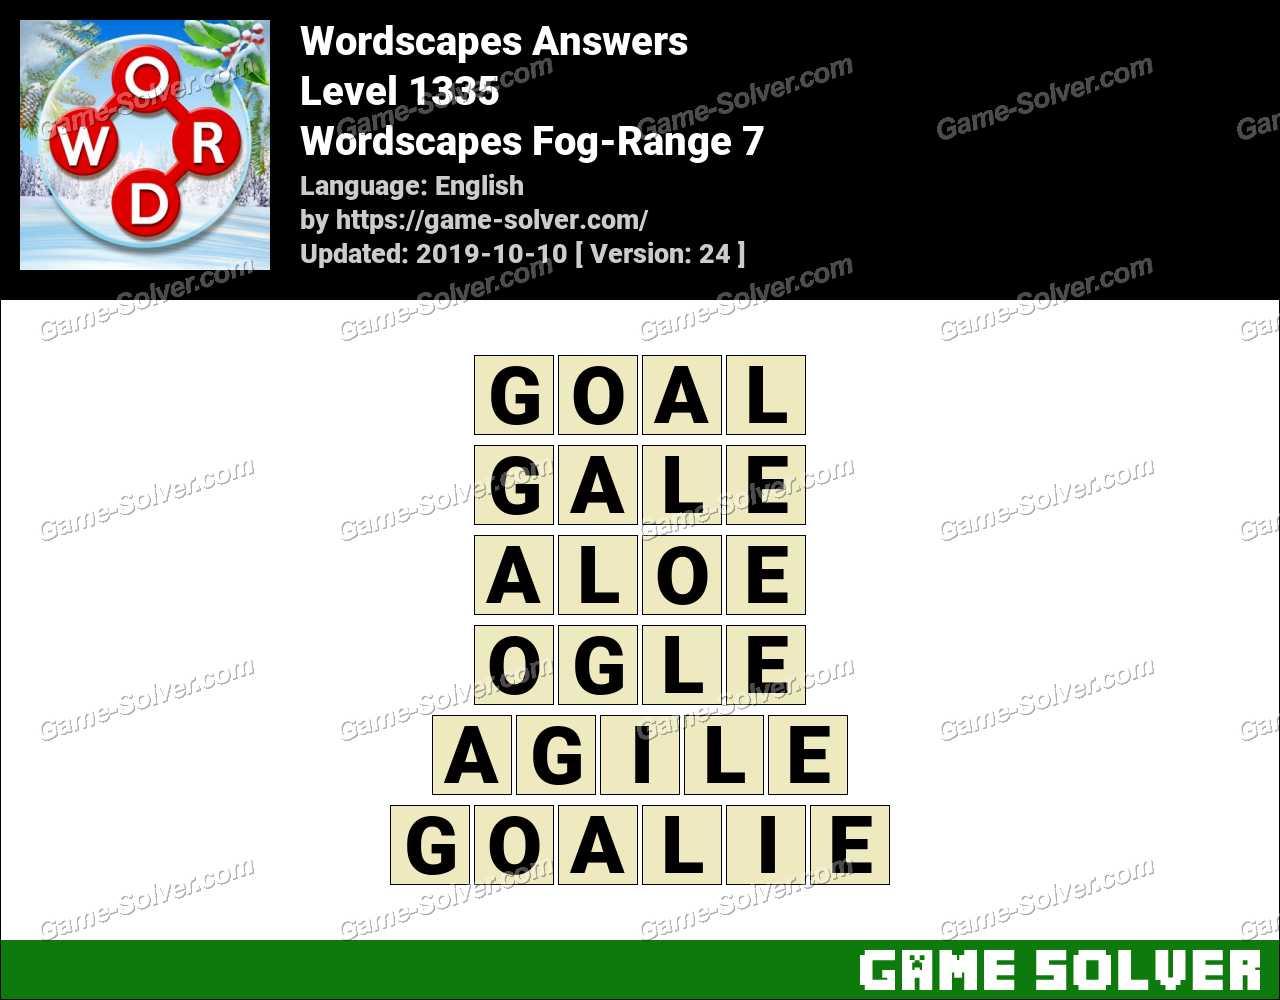 Wordscapes Fog-Range 7 Answers